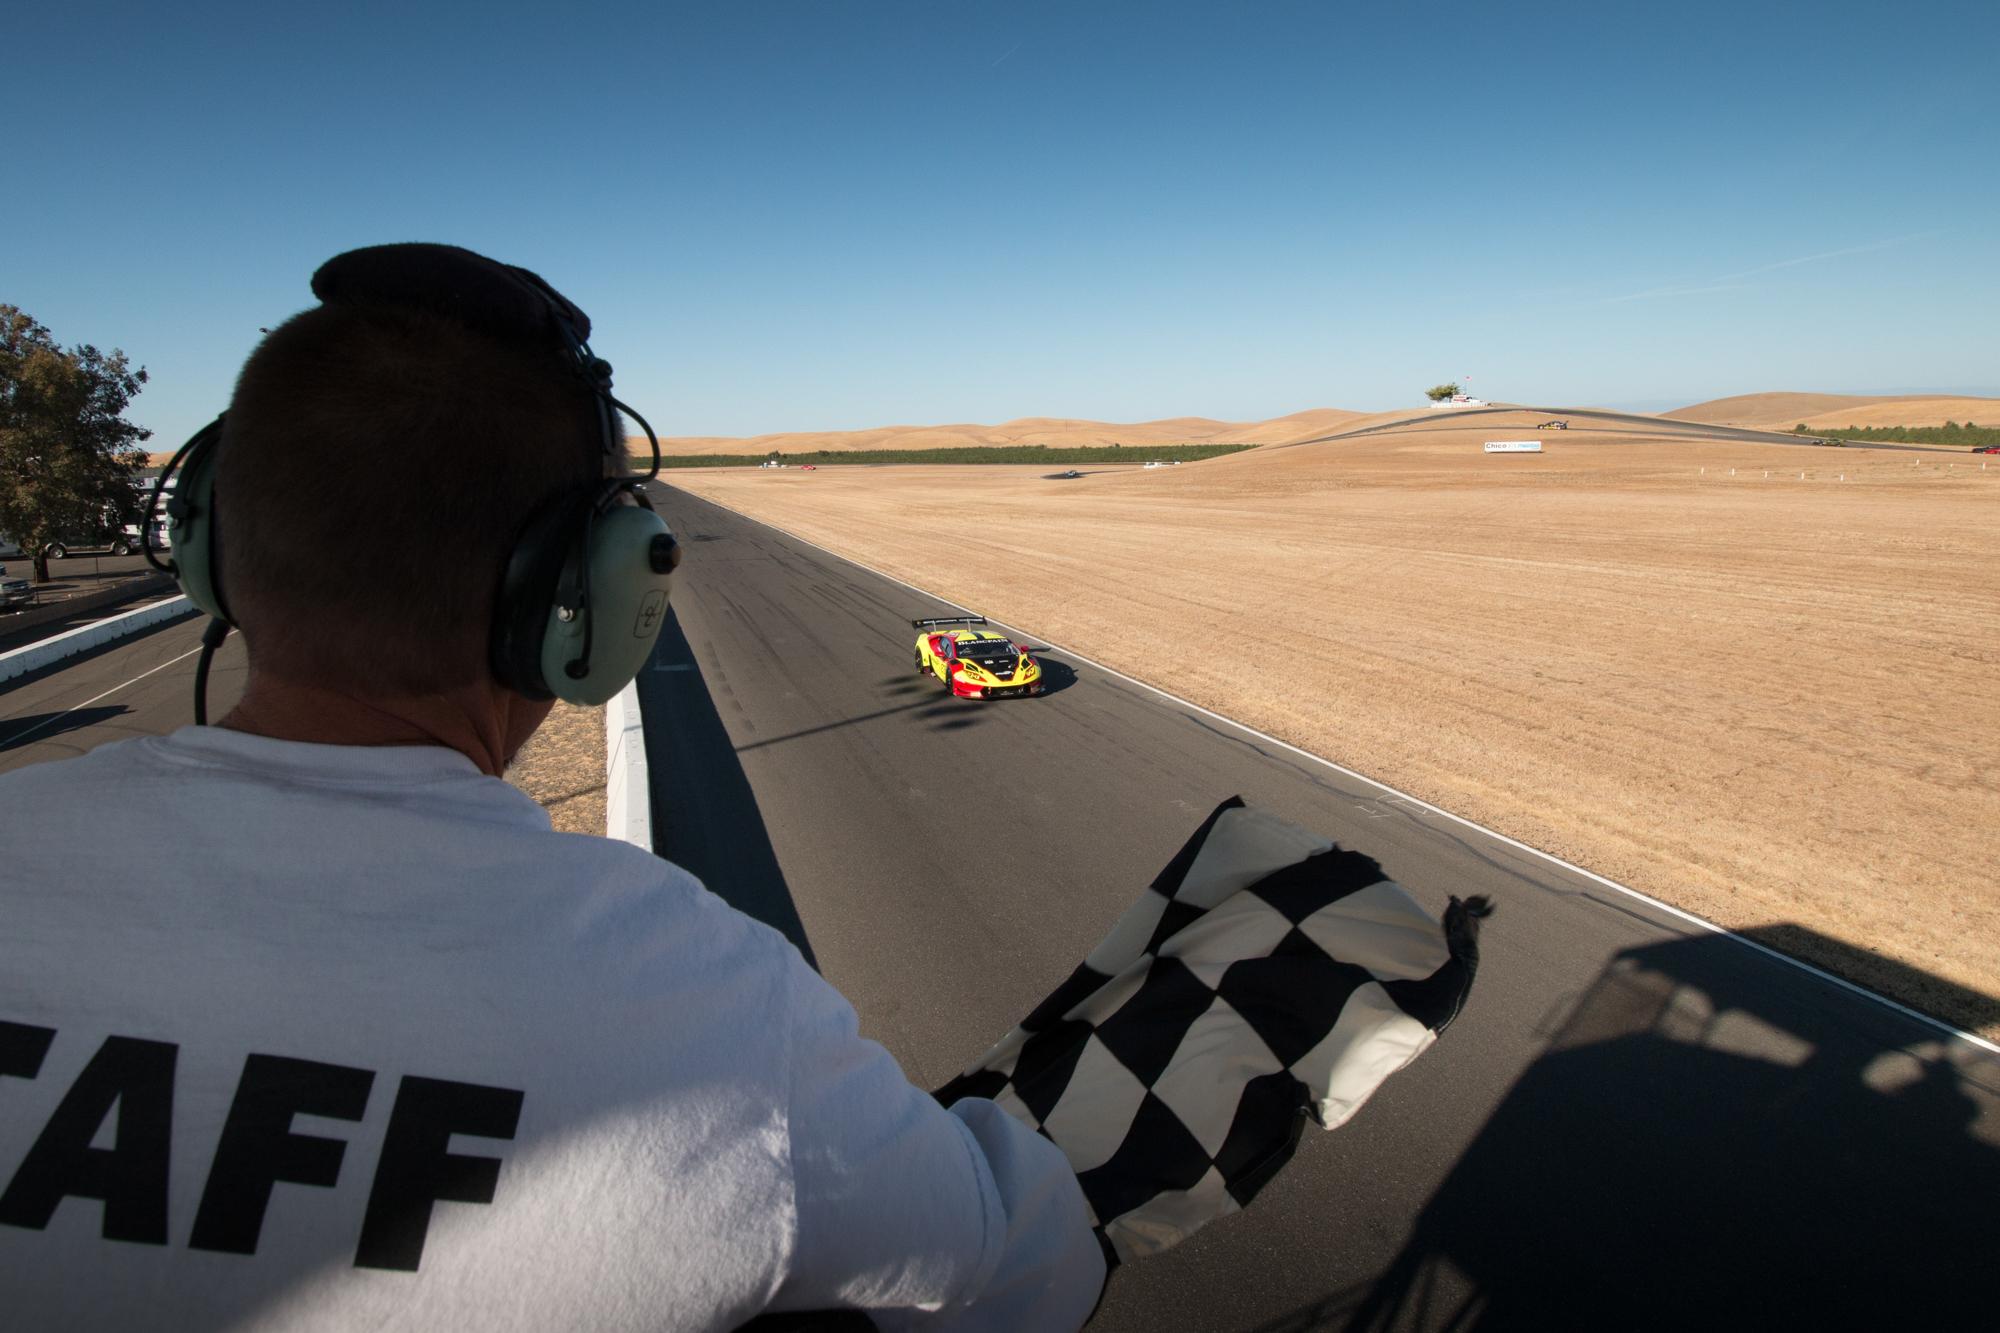 Steven-Racing-20130208-45803.jpg